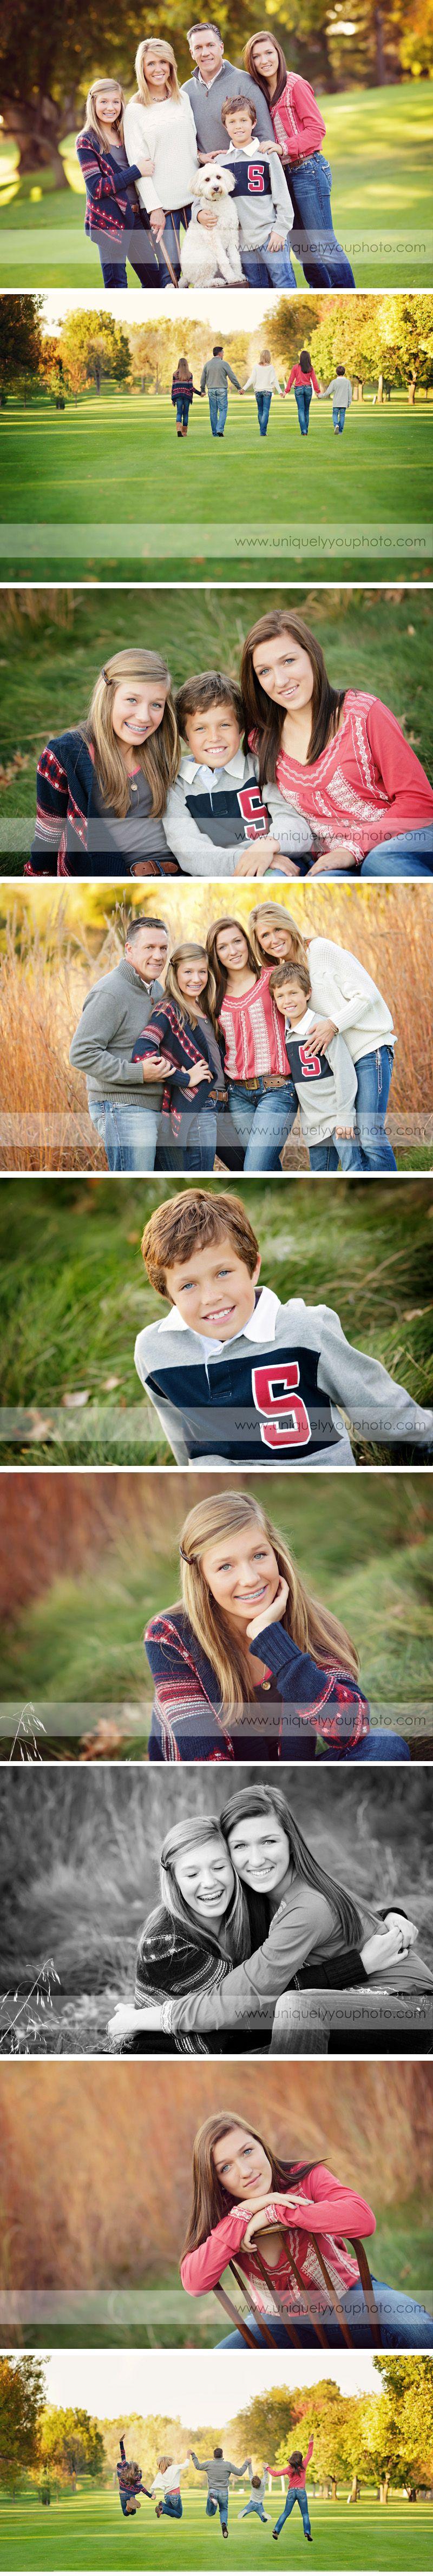 Lincoln Nebraska Family Newborn Baby Photographer Uniquely You Photography Fall Family Pictures Family Picture Poses Family Photos